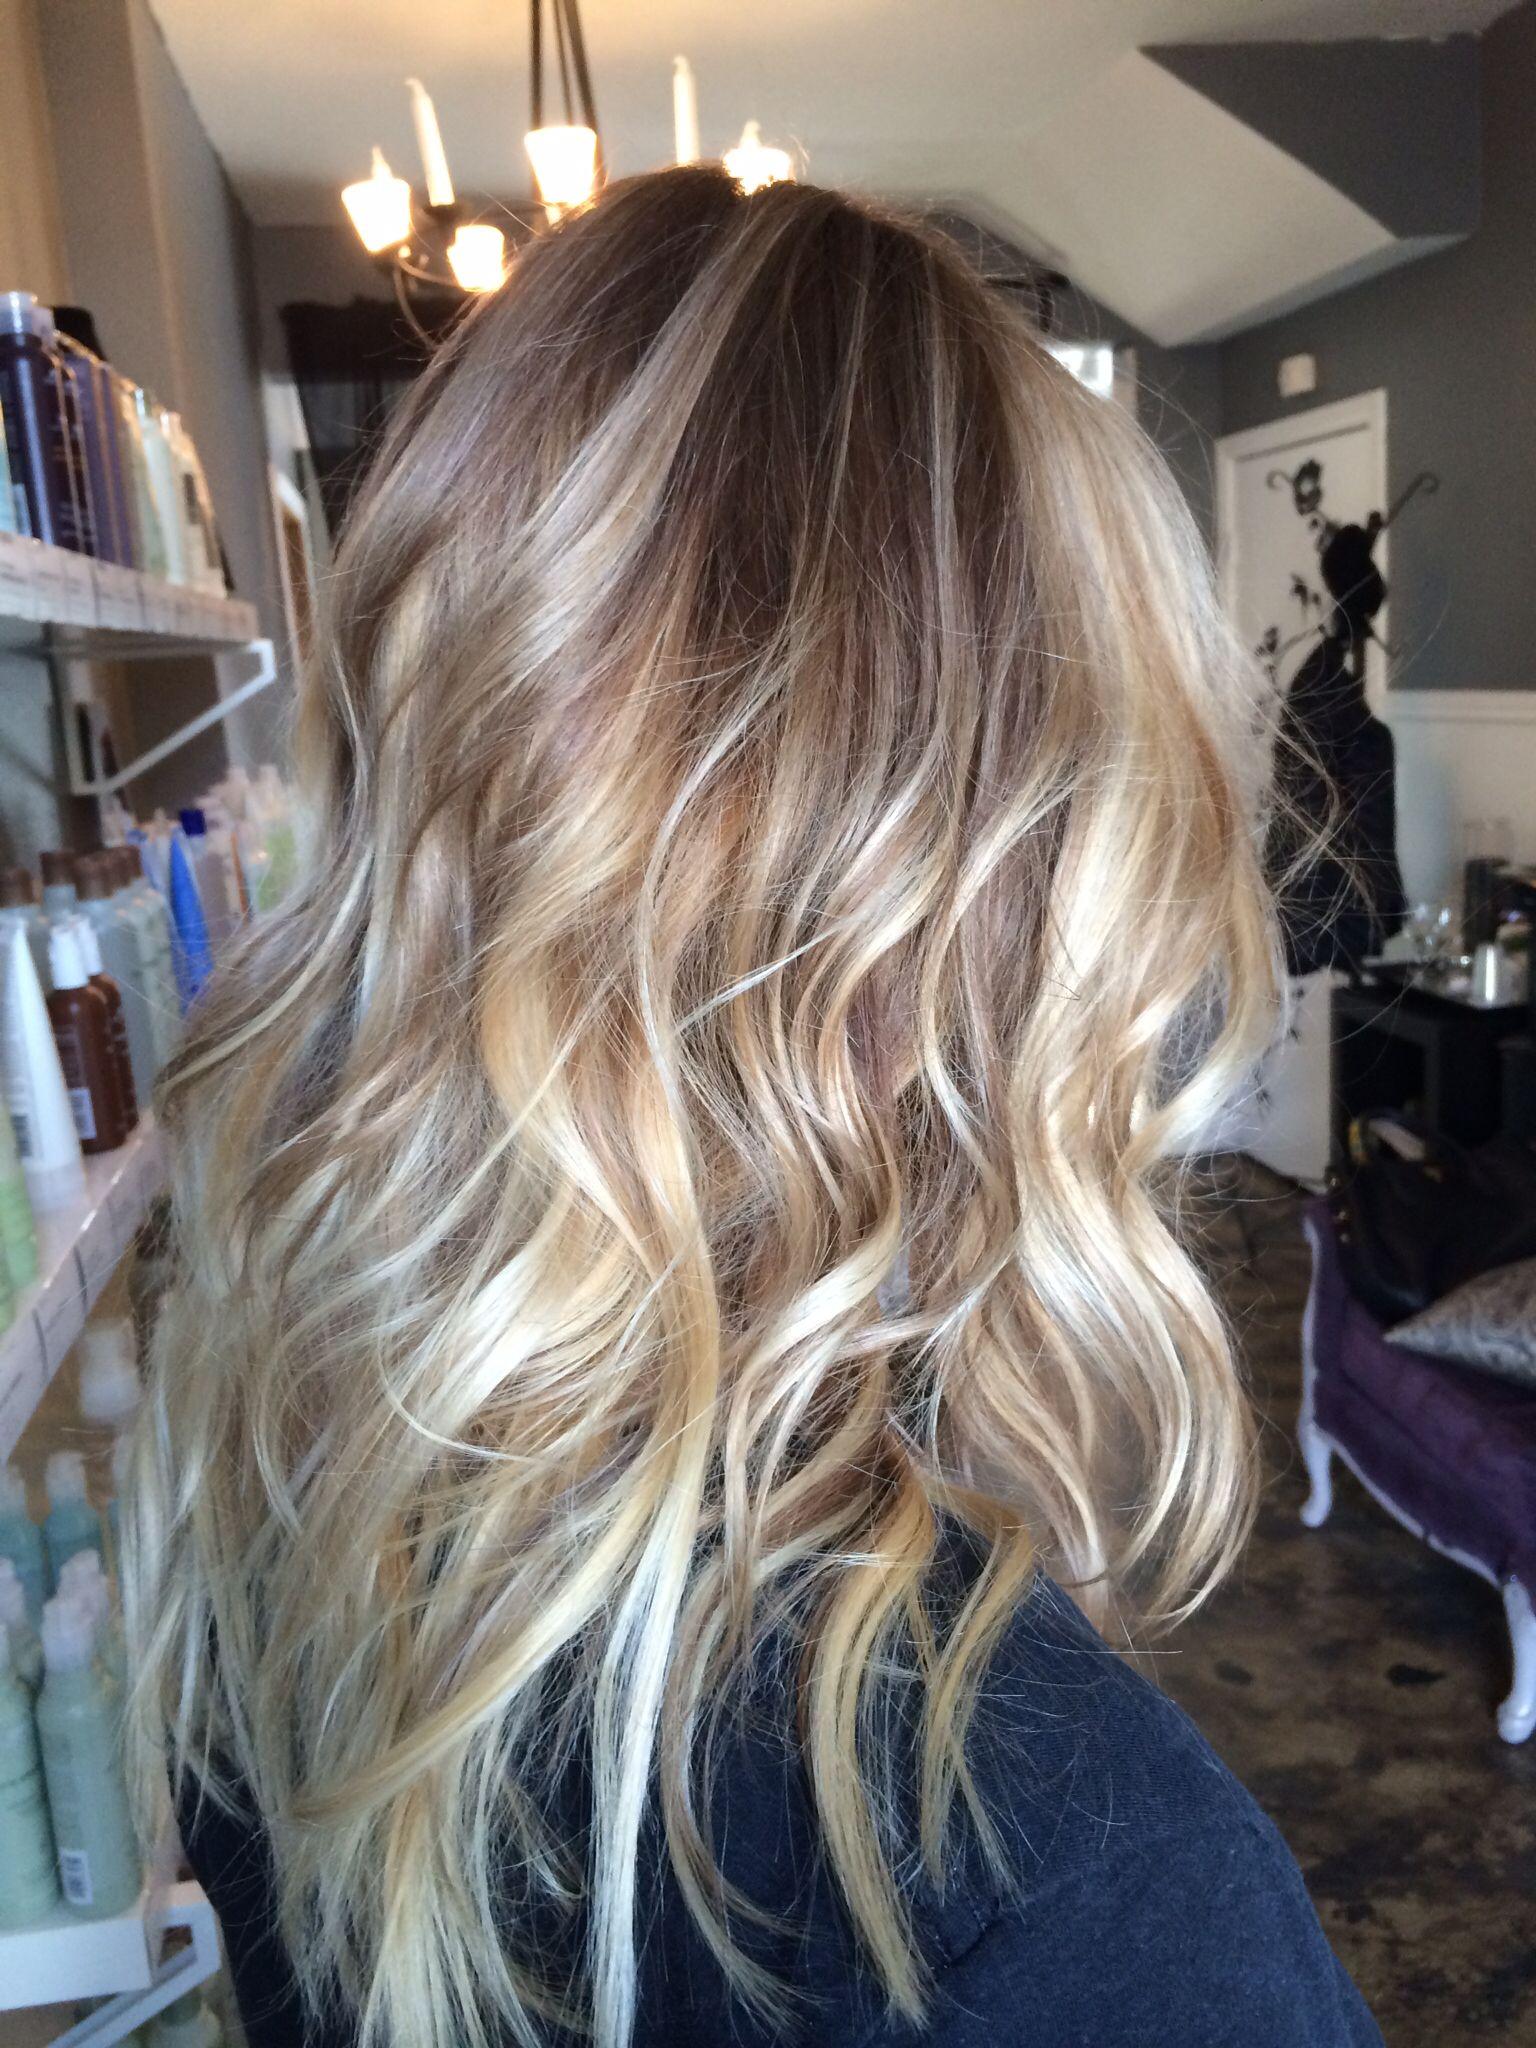 Avedacolor ombré and bayalage blonde holliskinghair hair